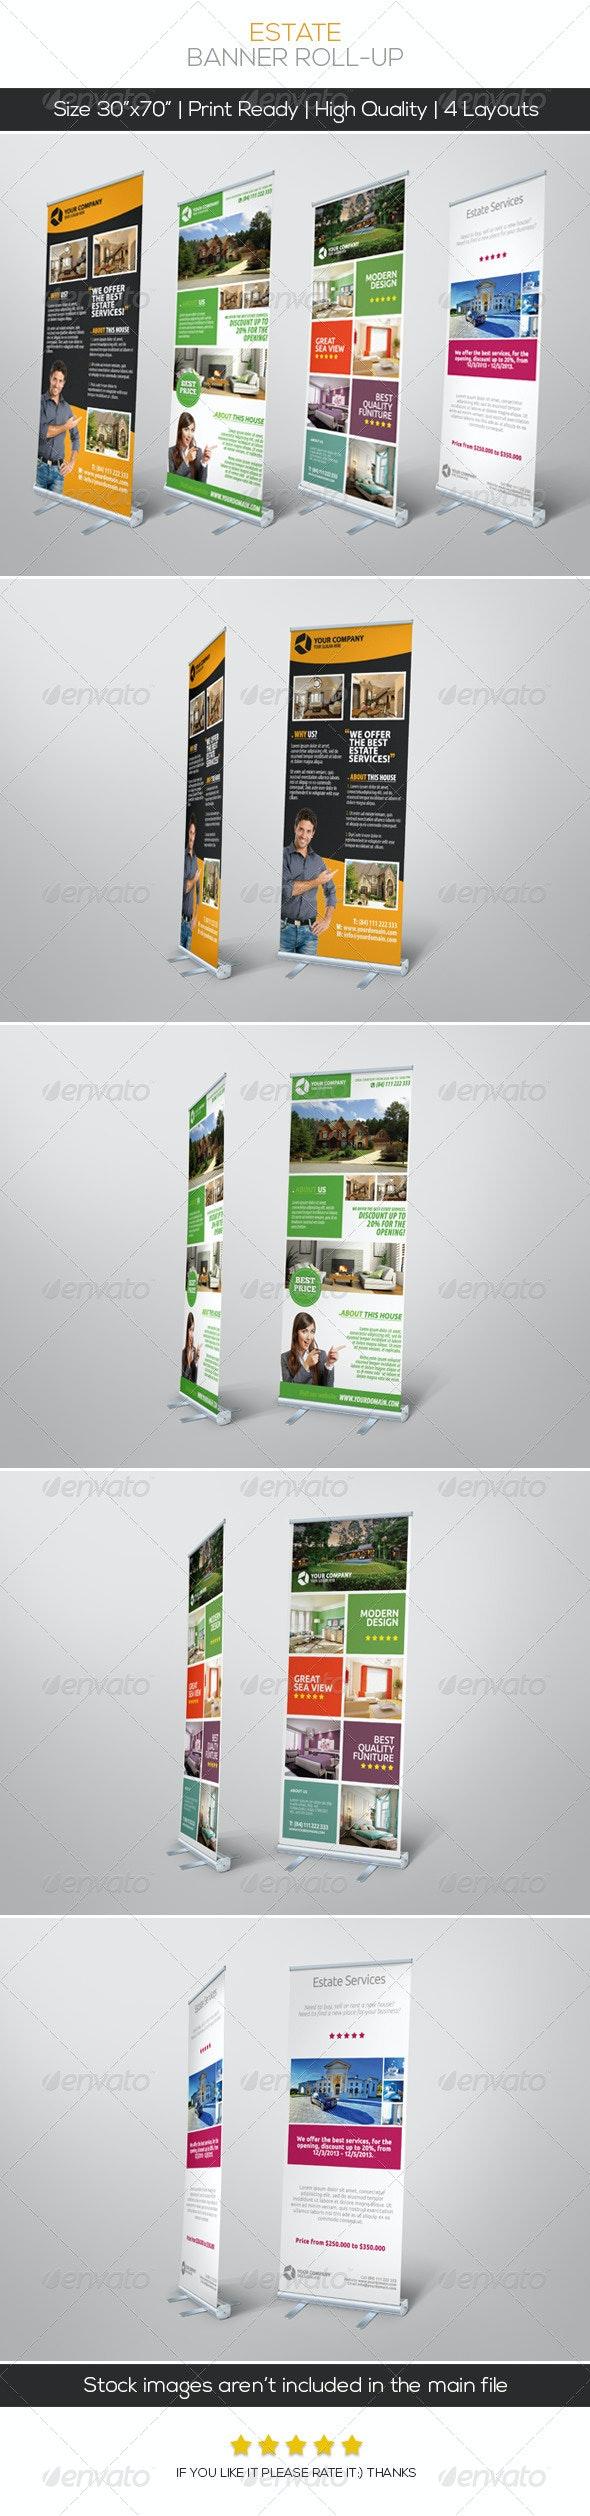 Premium Estate Banner Roll-up - Signage Print Templates